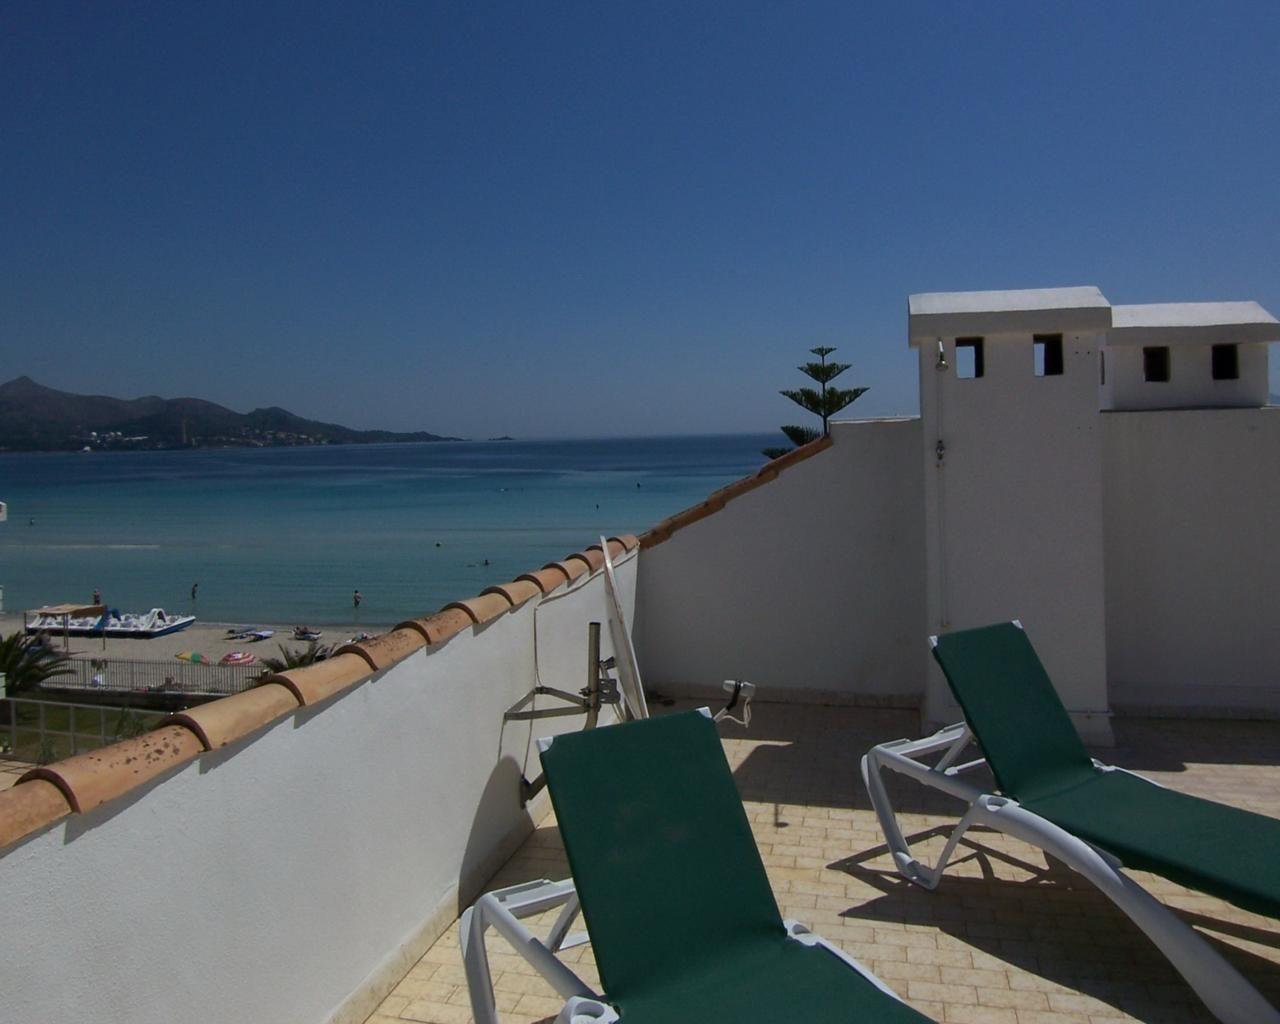 Bild 4 - Ferienwohnung Playa de Alcudia - Ref.: 150178-526 - Objekt 150178-526